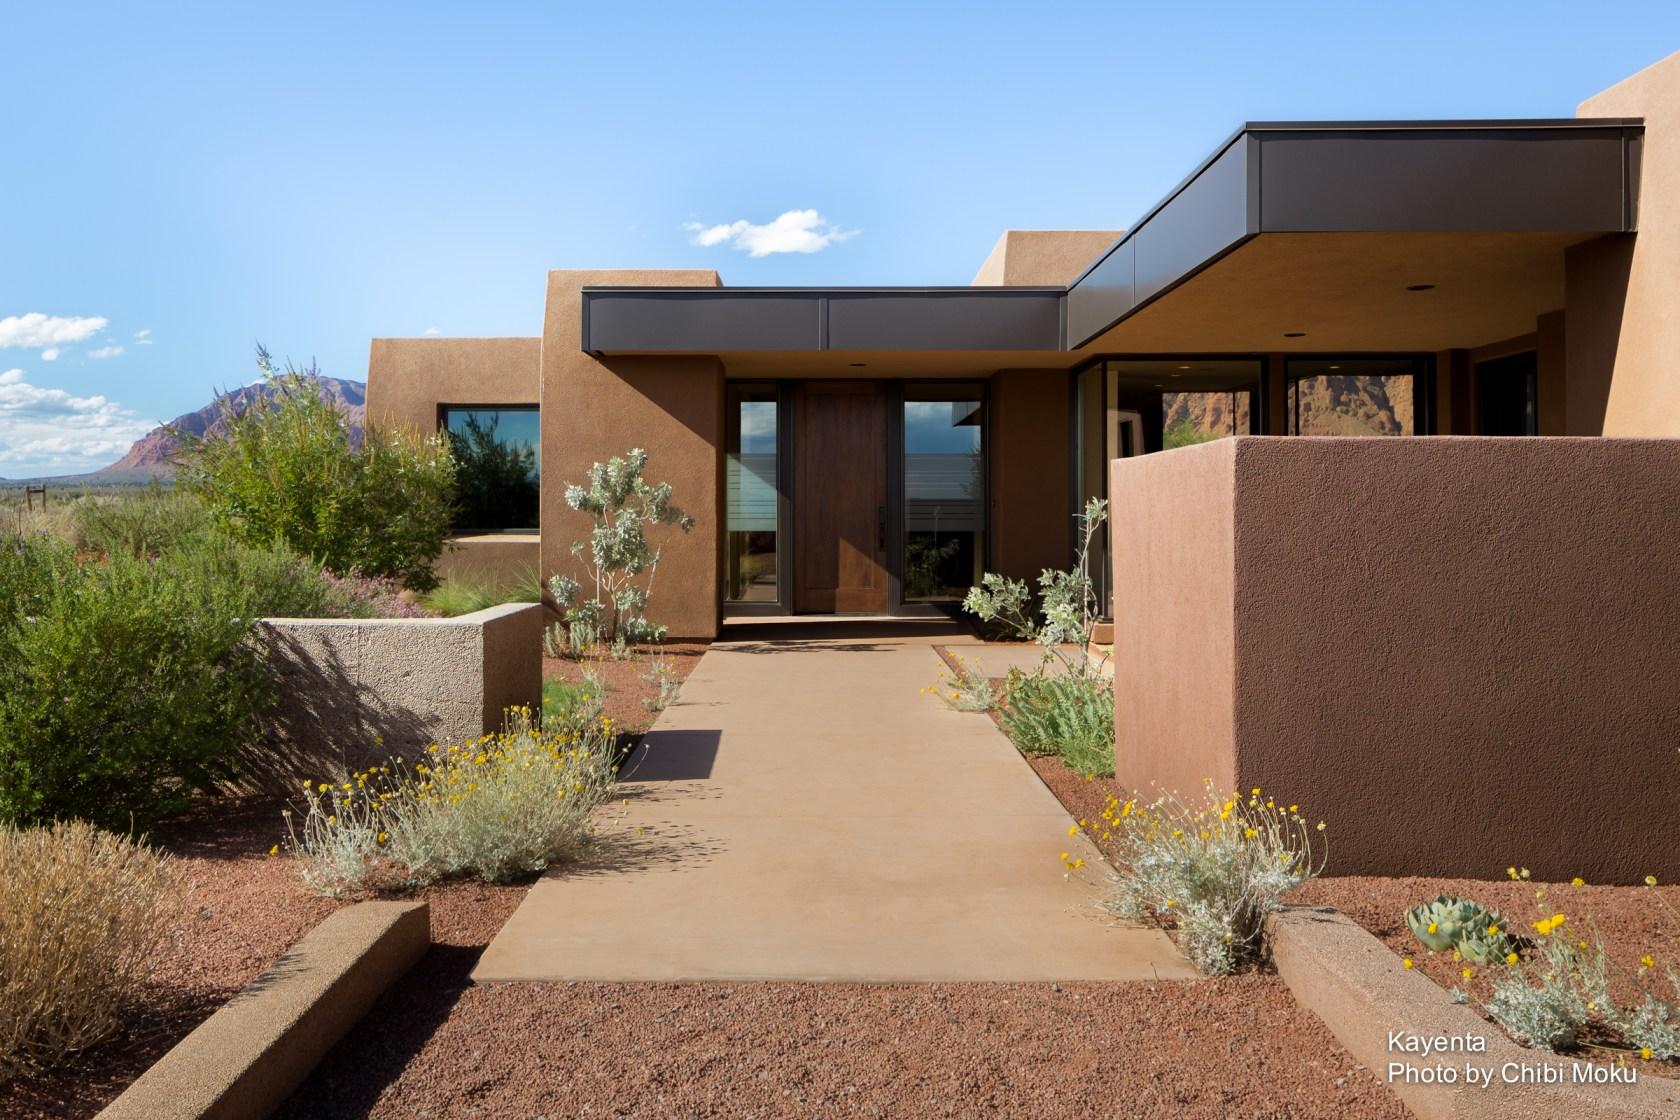 Kayenta Concept Home Ivins Utah - Architizer